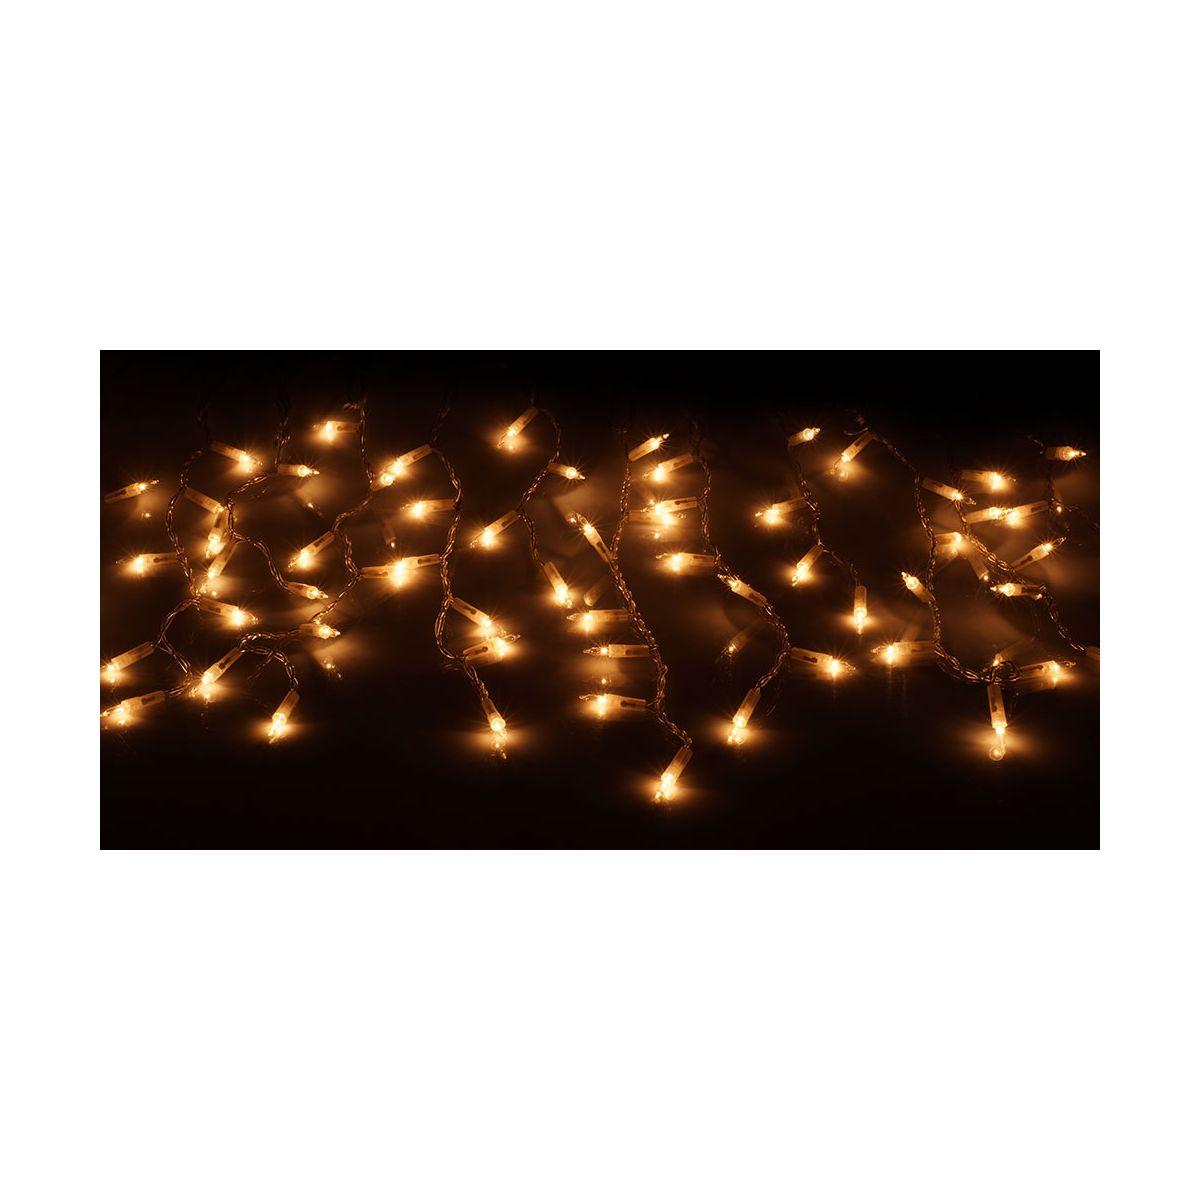 Lampki choinkowe 'sople' LWS-100 G  barwa ciepła